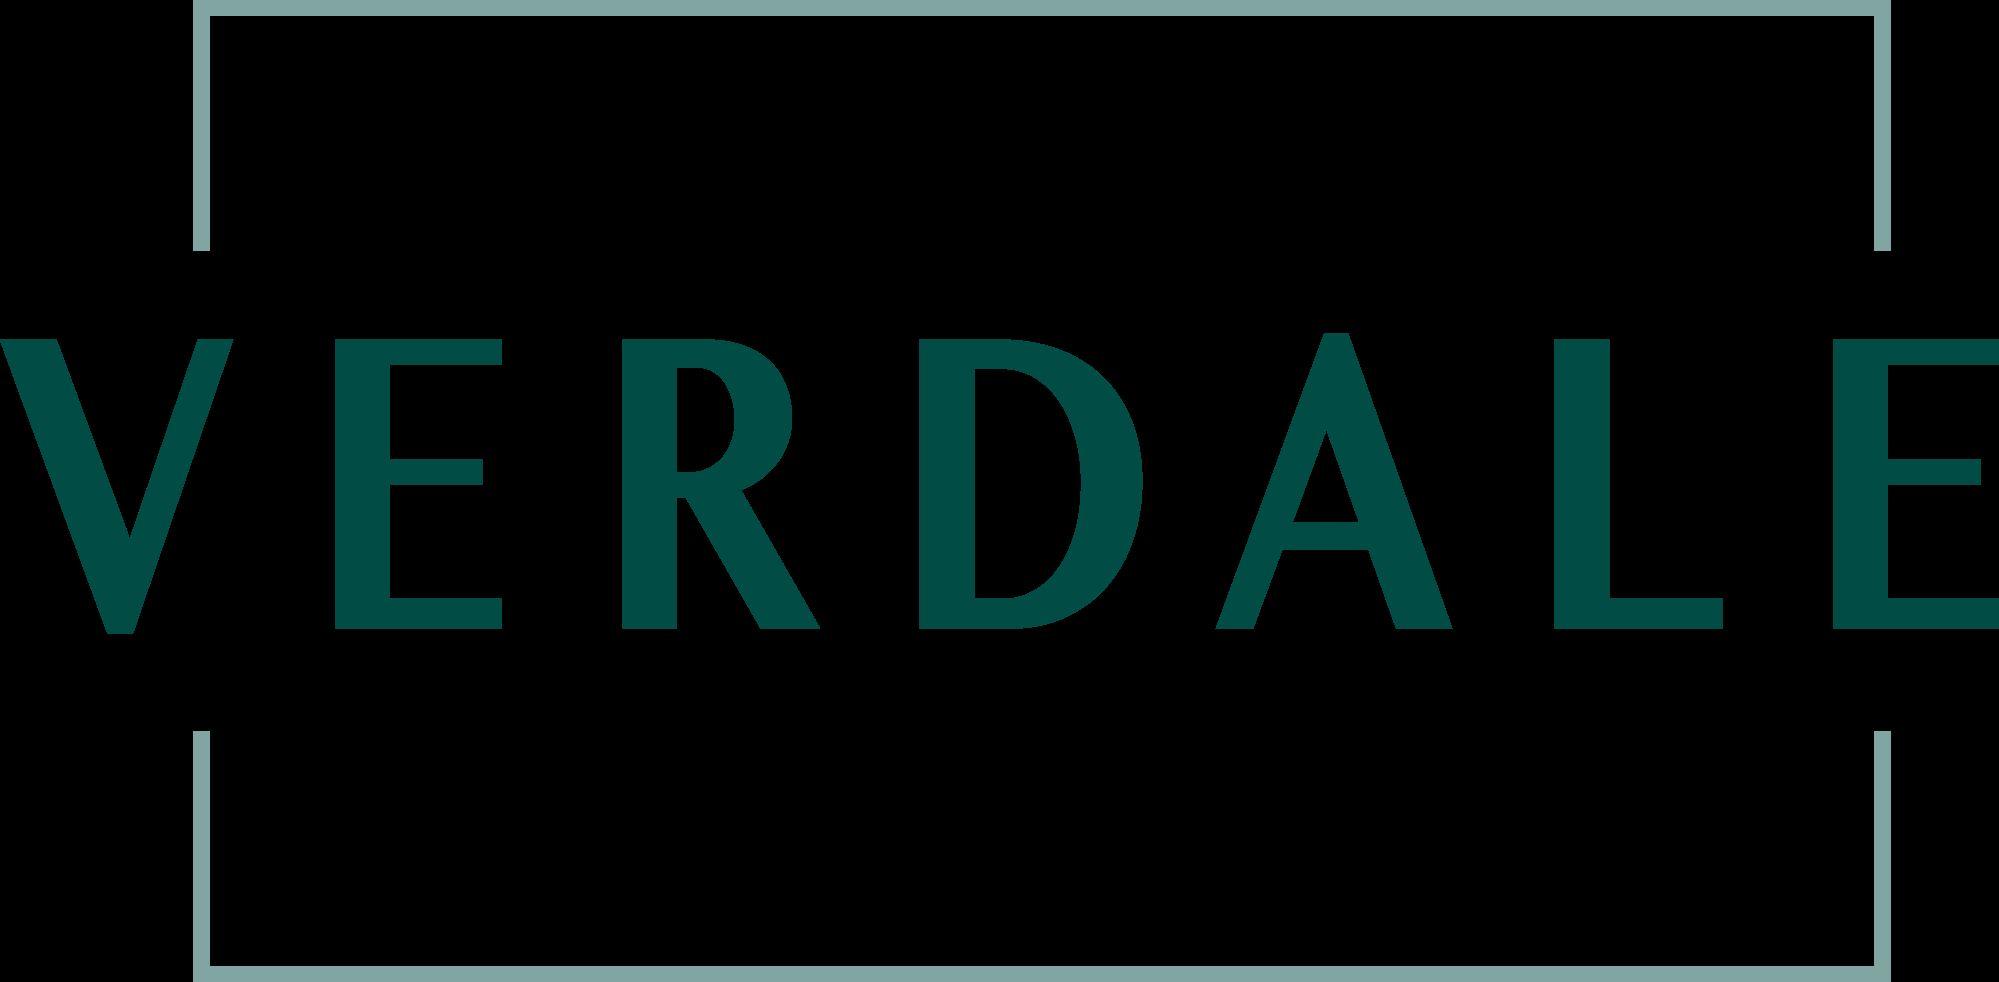 Verdale logo